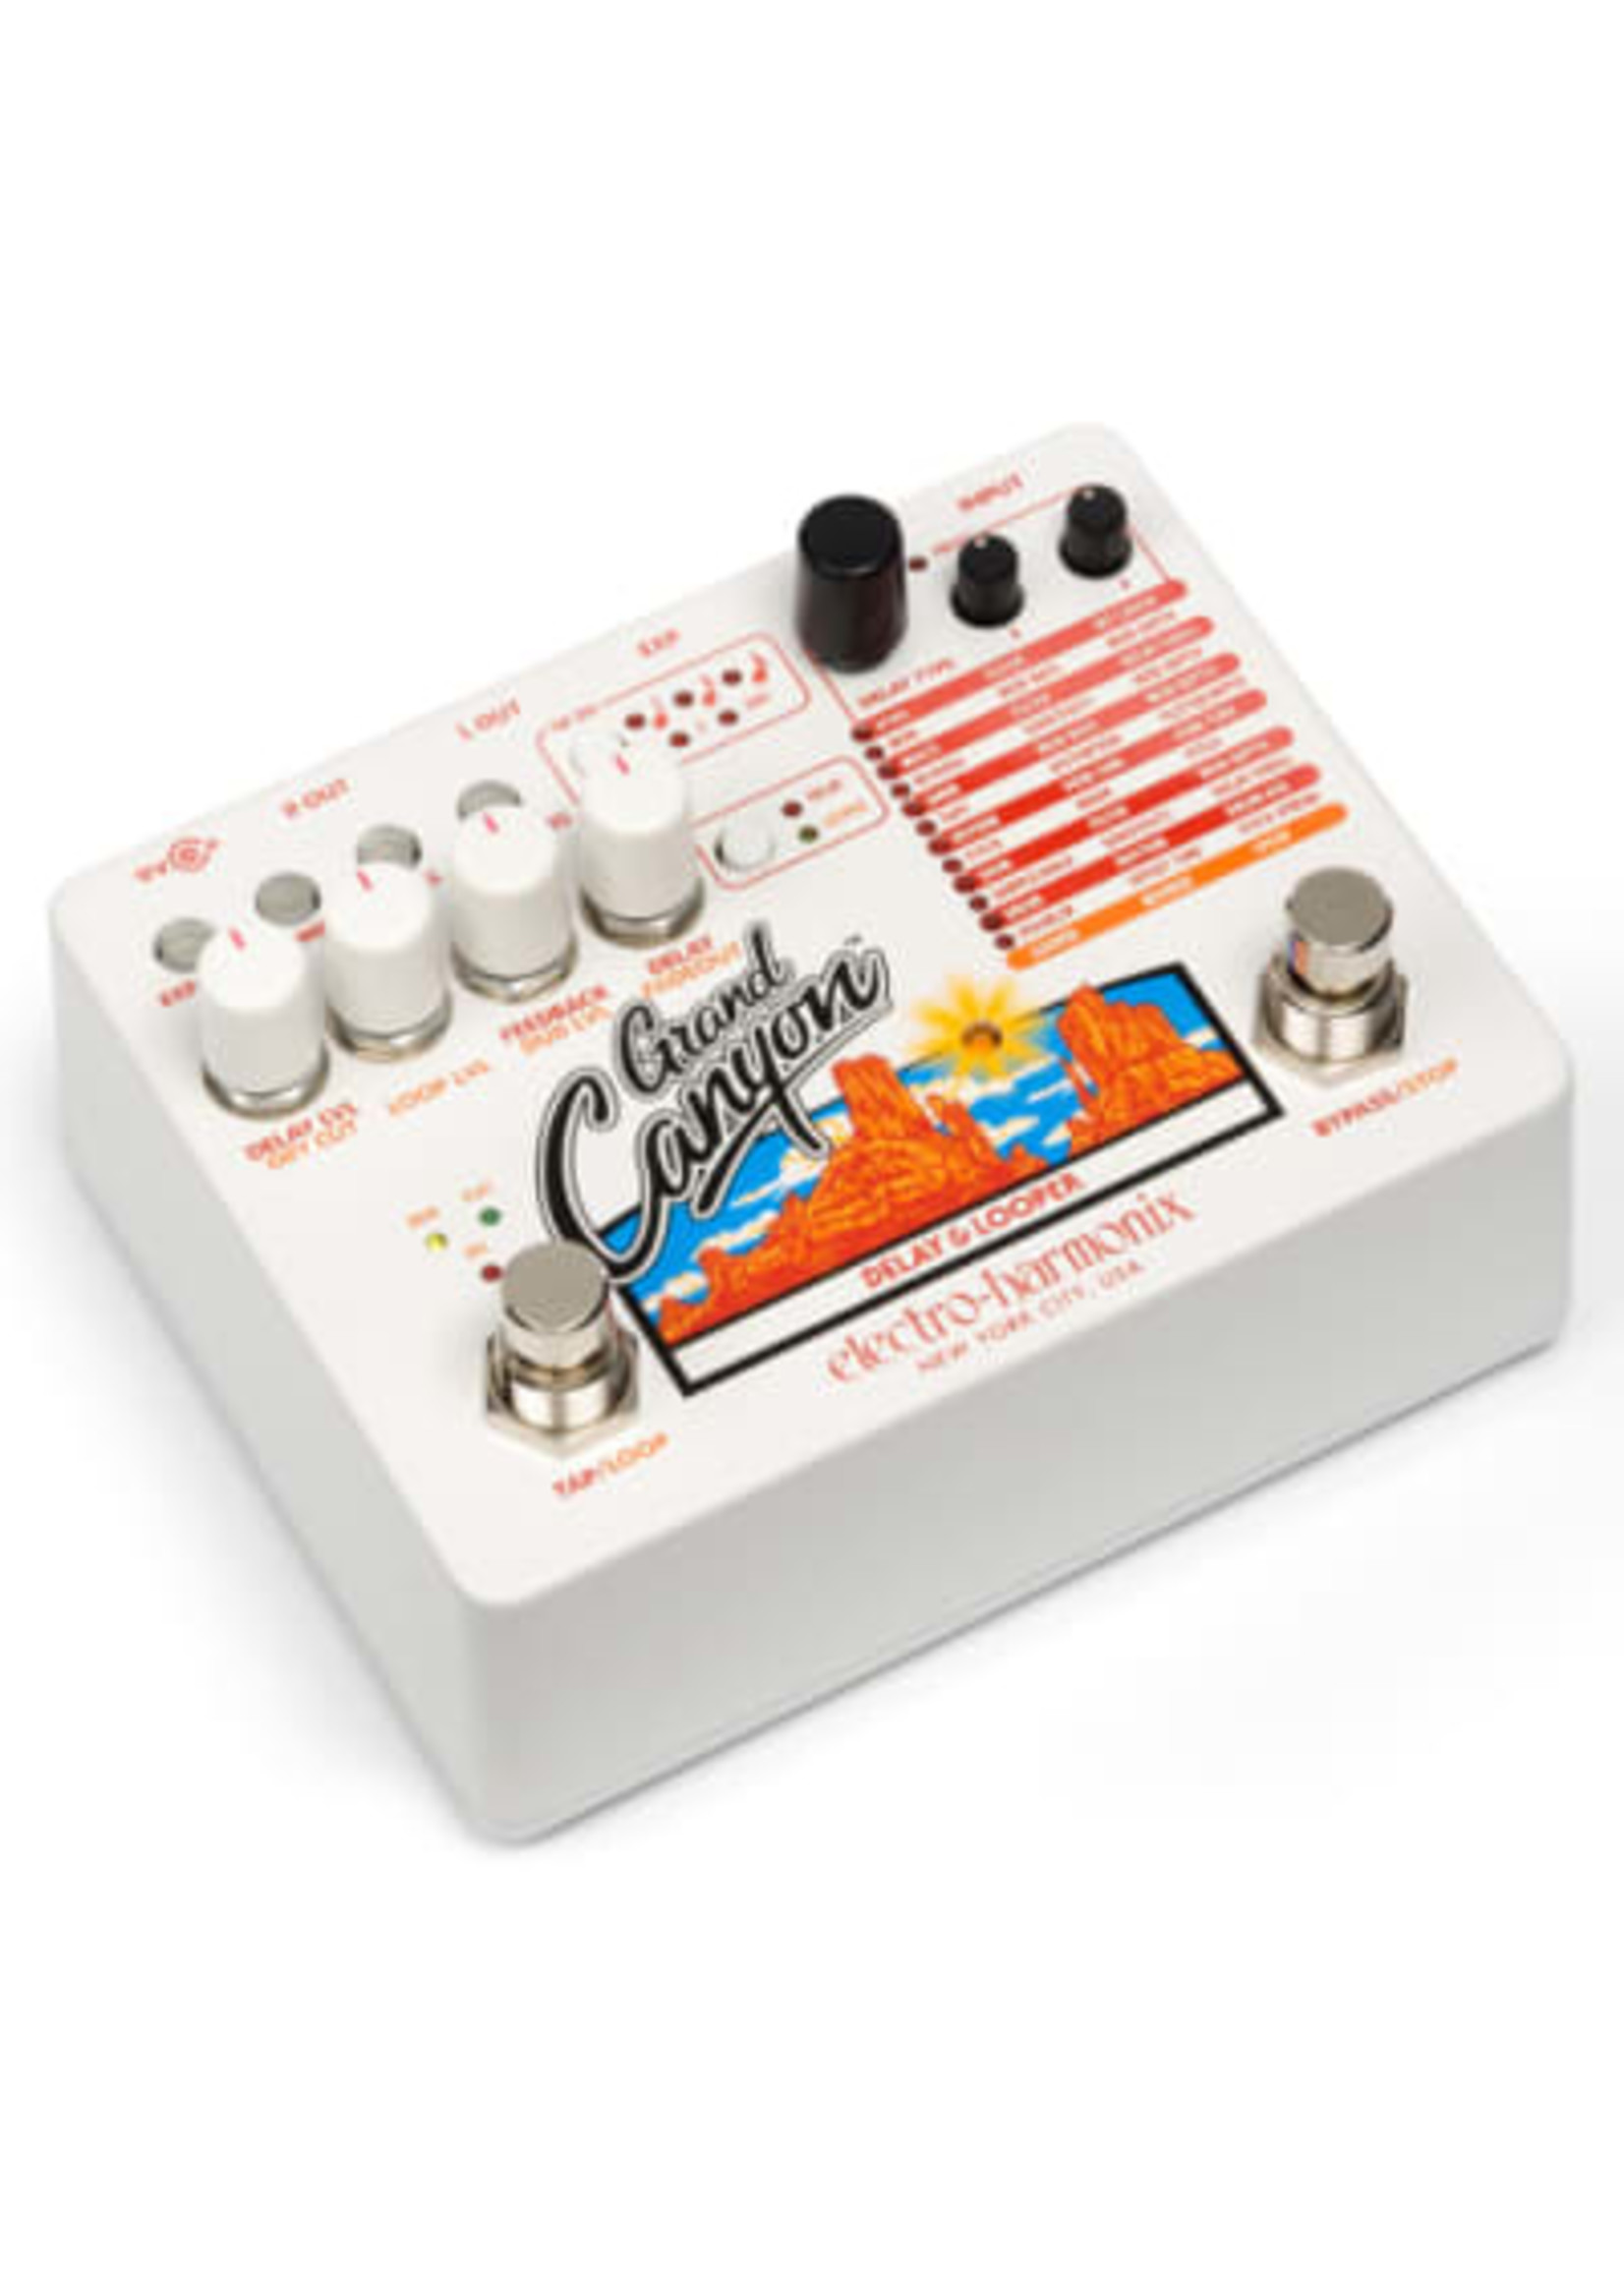 Electro-Harmonix Electro-Harmonix Grand Canyon Looper-Delay